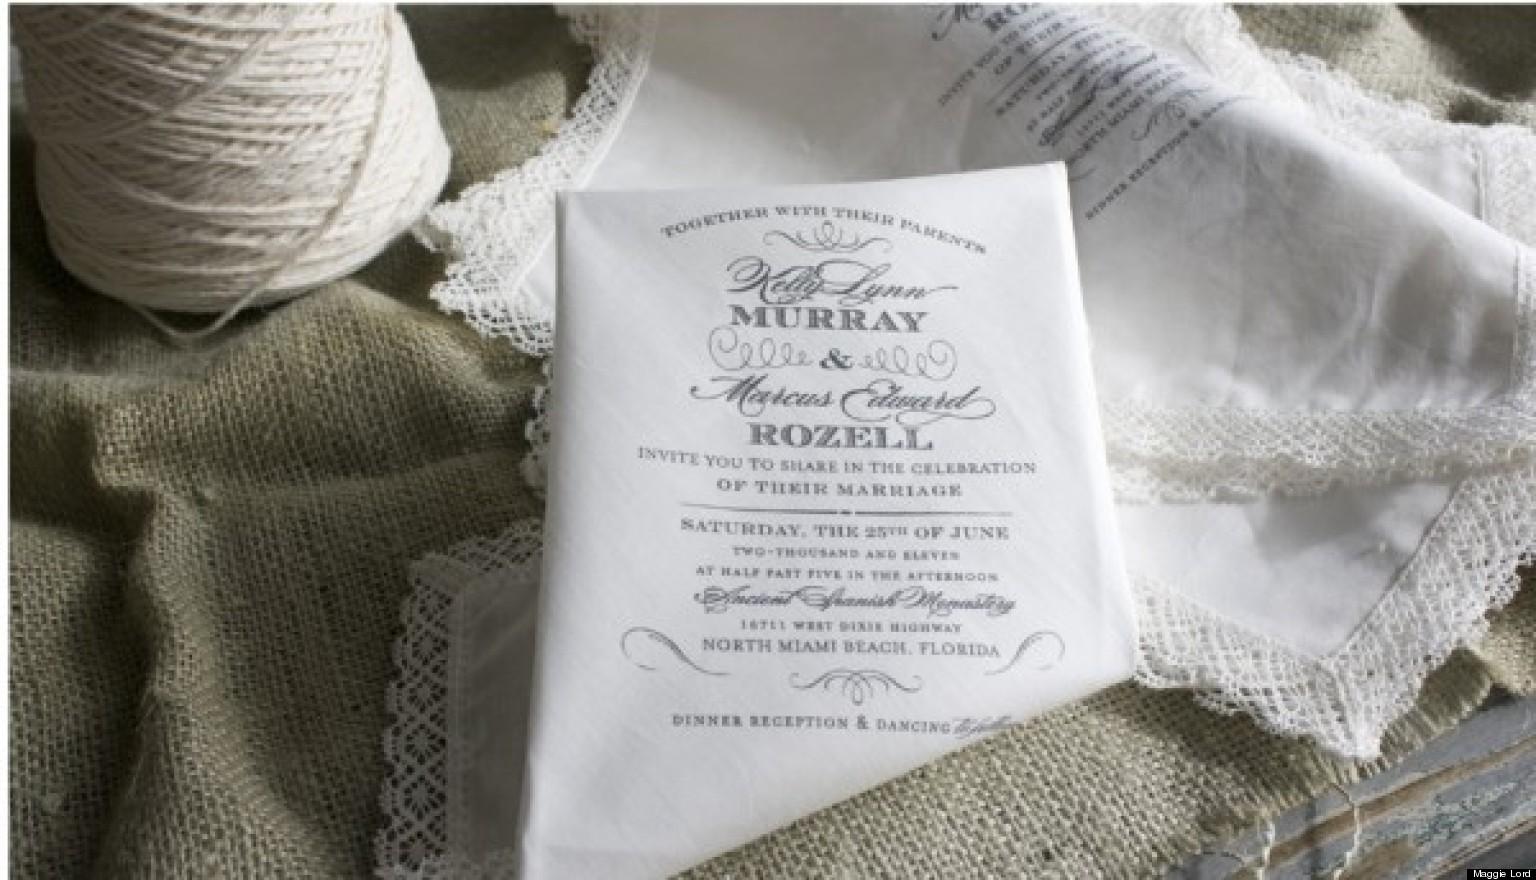 high end wedding invitations. white monogram embroidered silk box, Wedding invitations